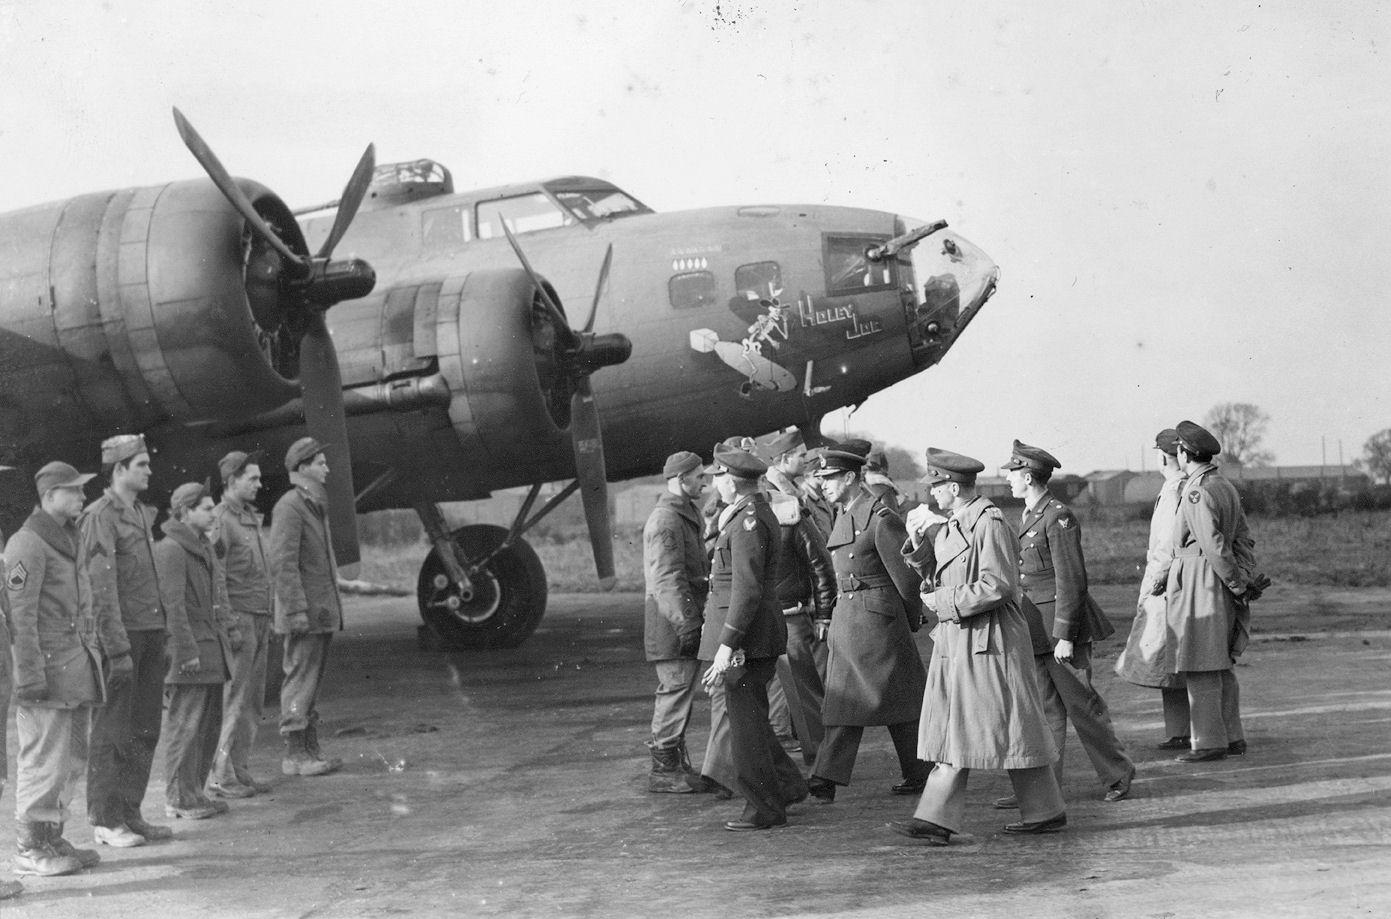 B-17 #41-24352 / Holey Joe